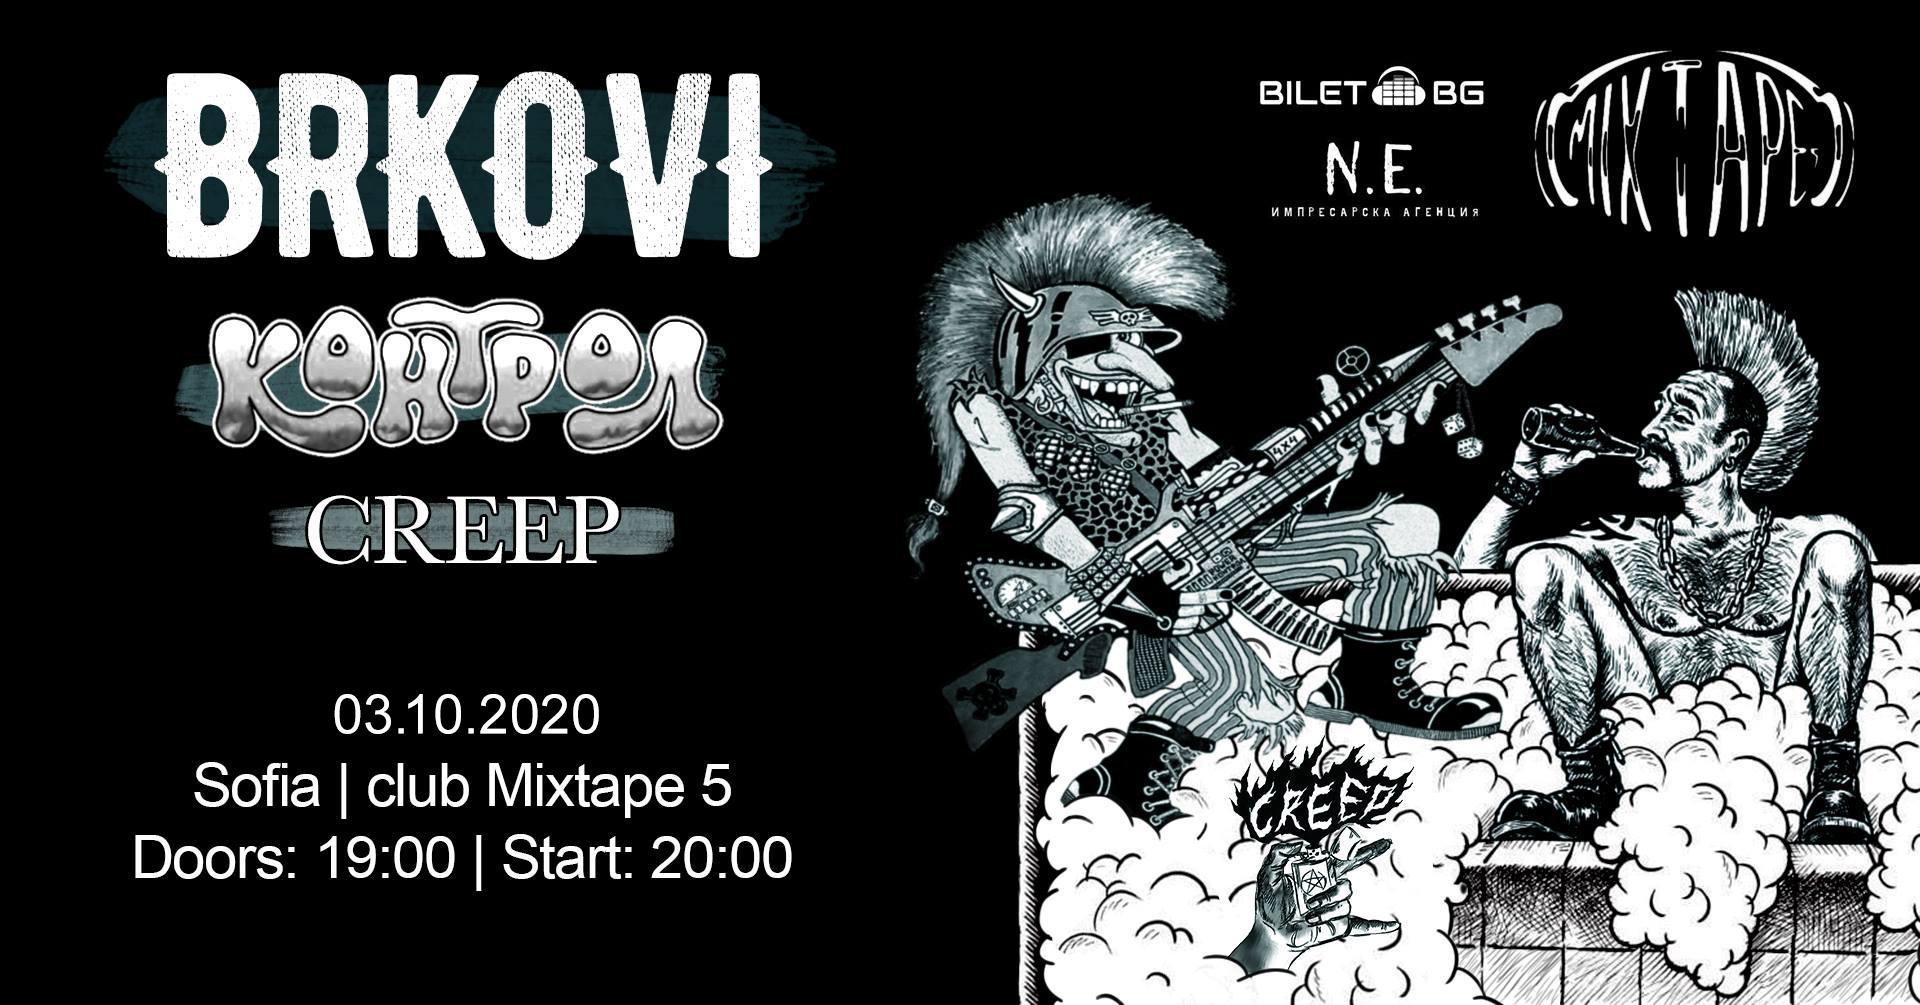 Brkovi / Контрол / Creep – 3 октомври 2020 – Mixtape 5, София